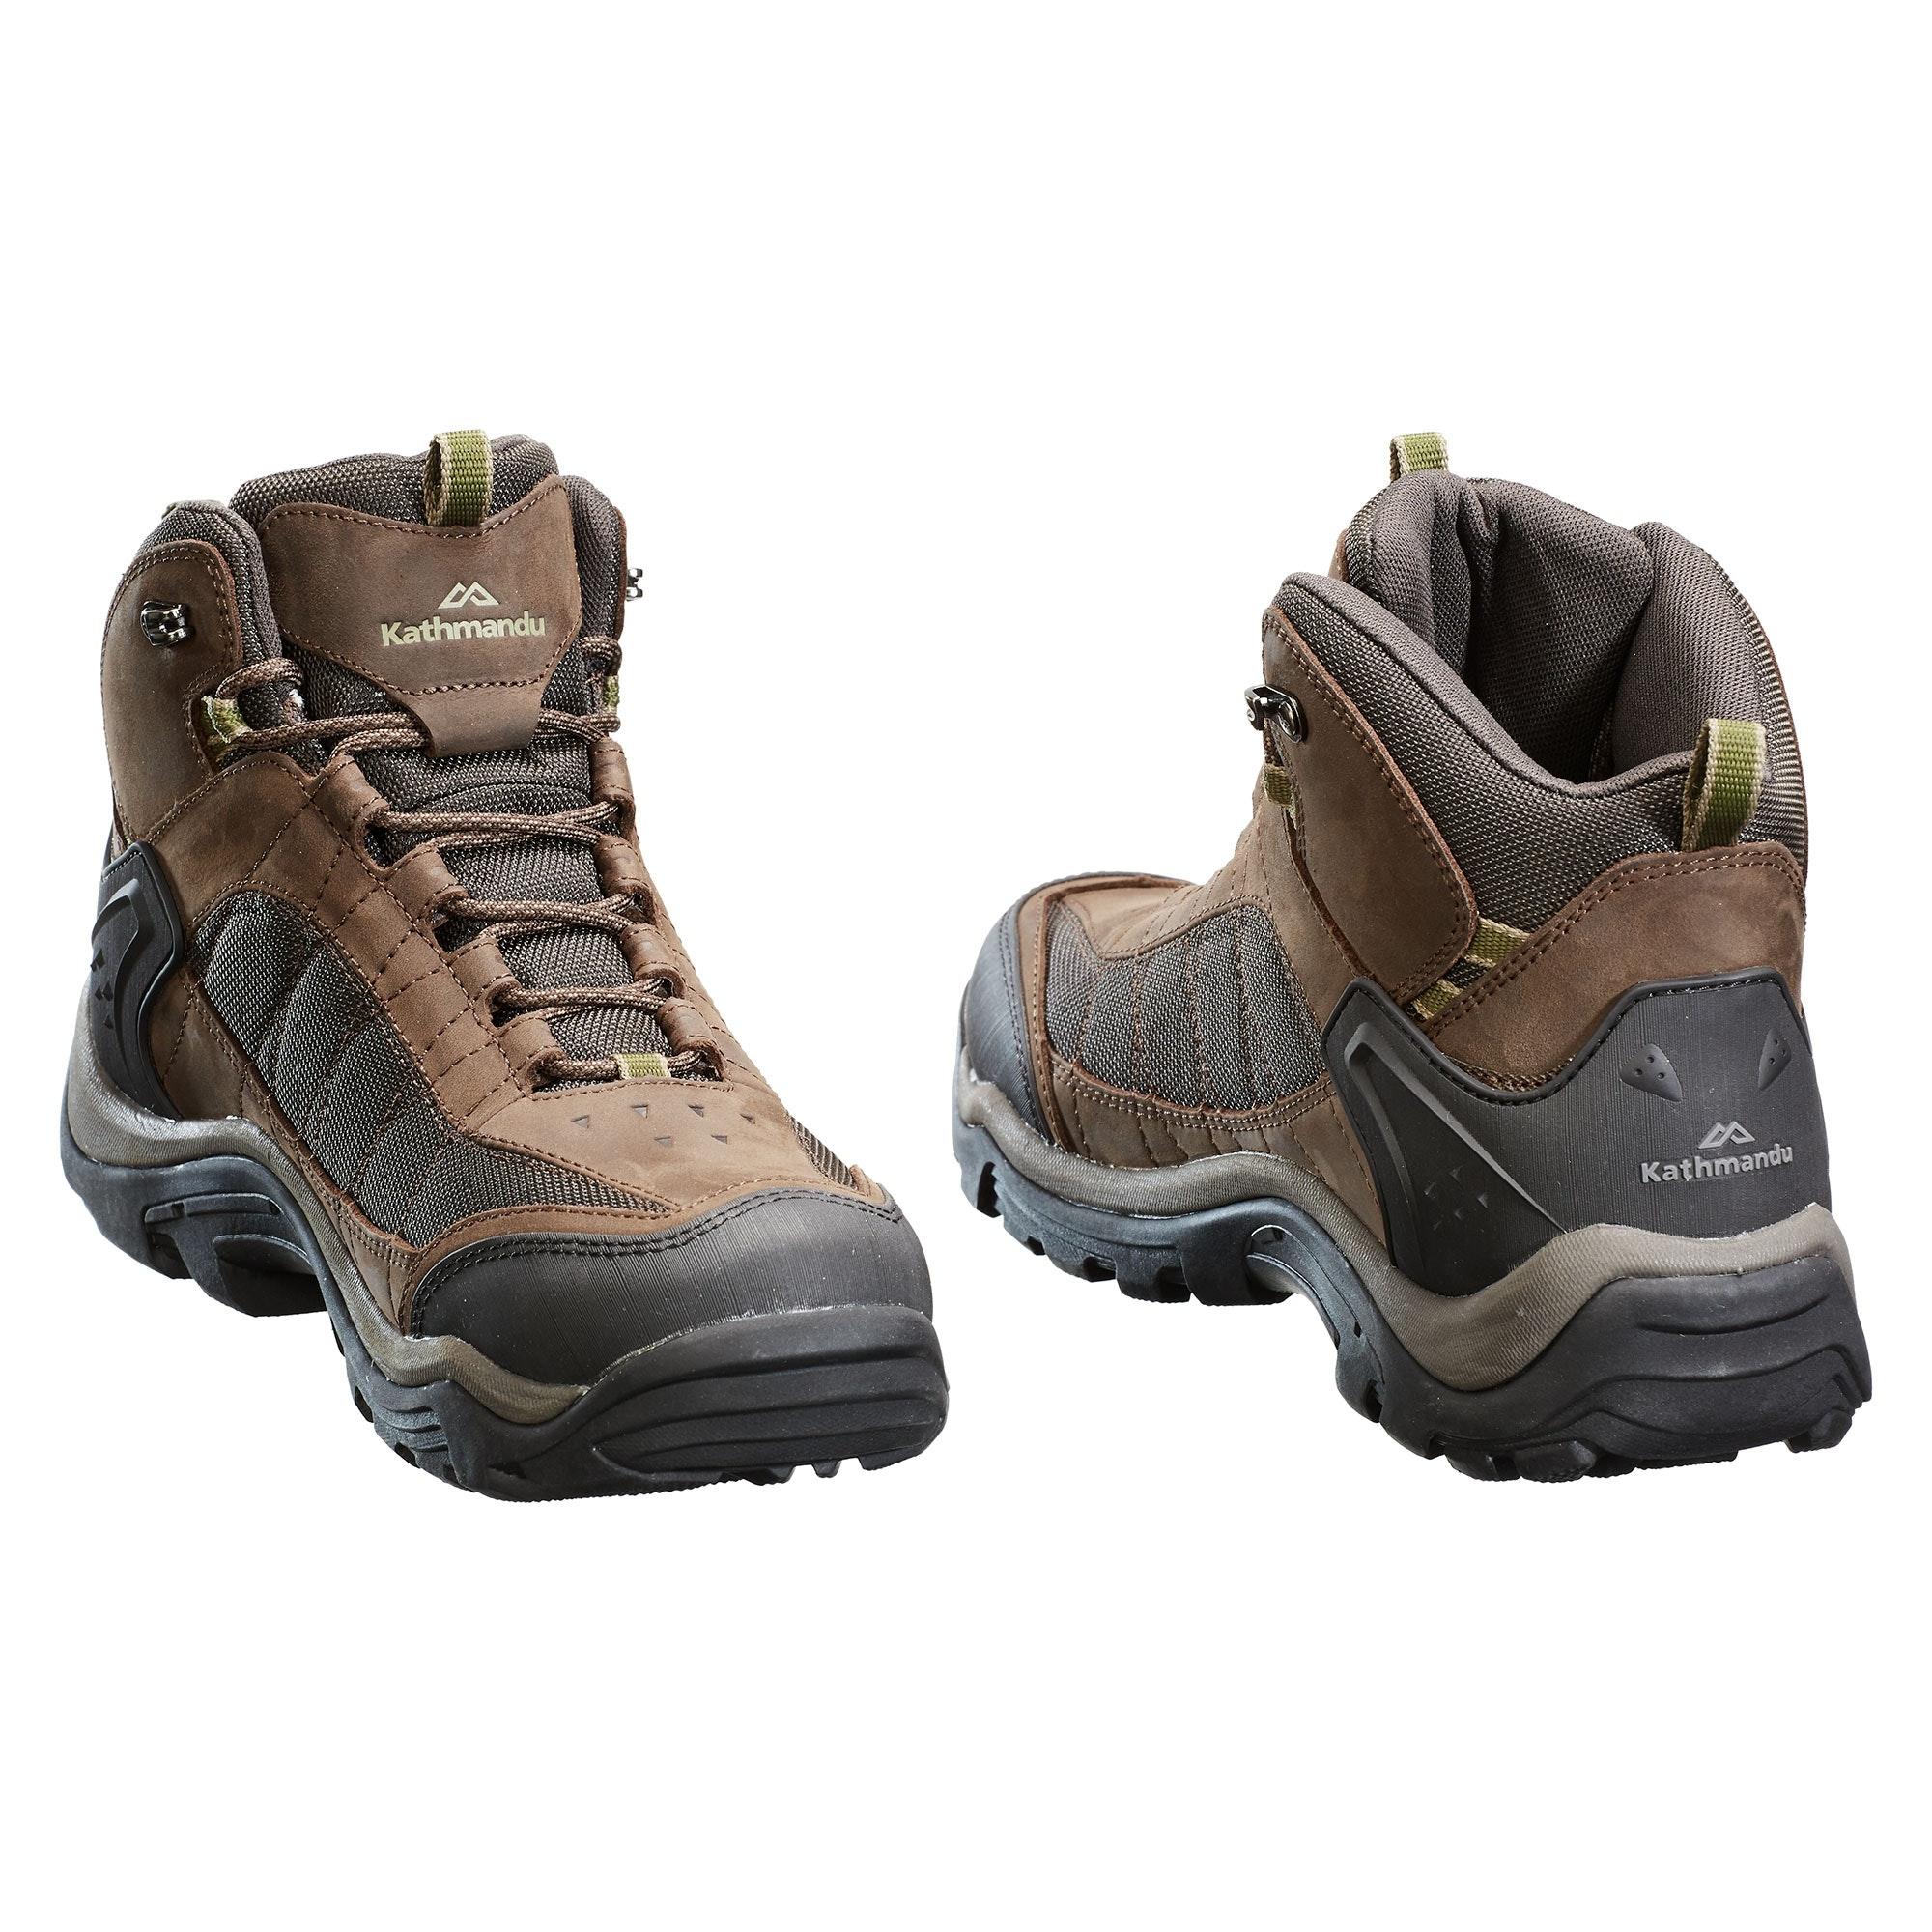 NEW-Kathmandu-Mornington-Mens-Vibram-Rubber-Waterproof-Lightweight-Hiking-Boots thumbnail 7